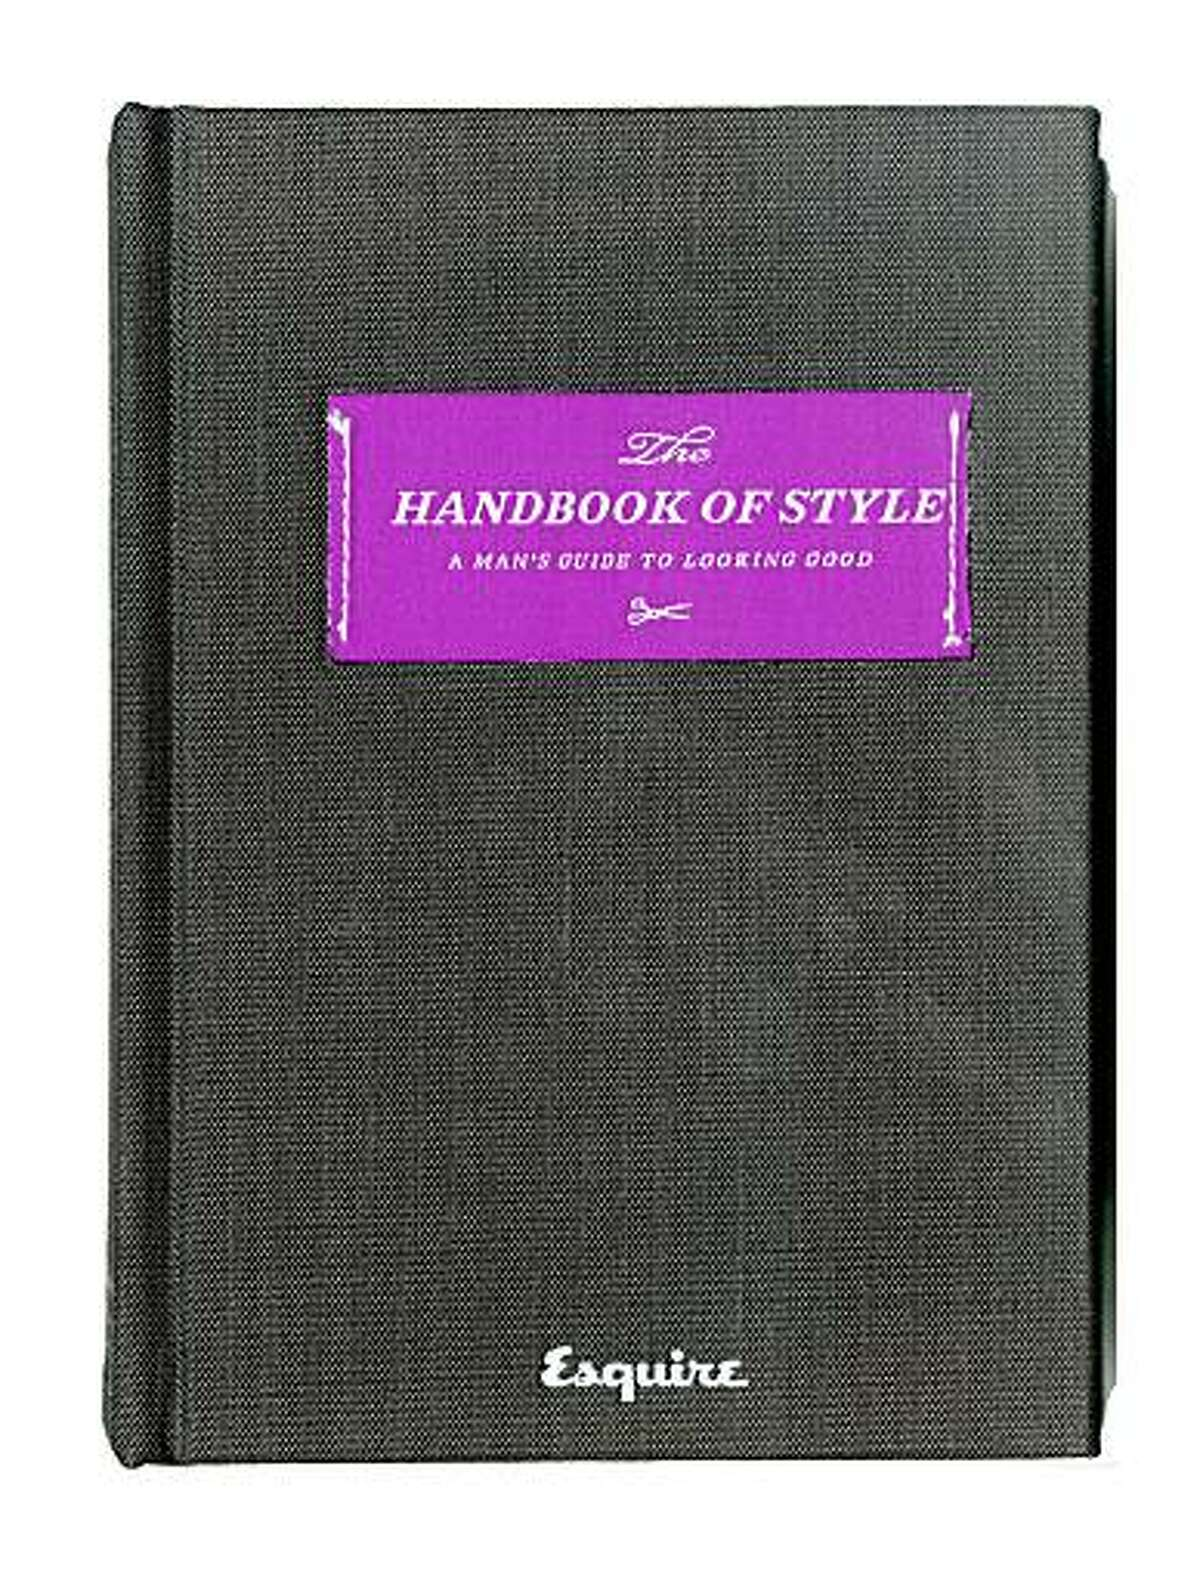 Book jacket of Handbook of Style